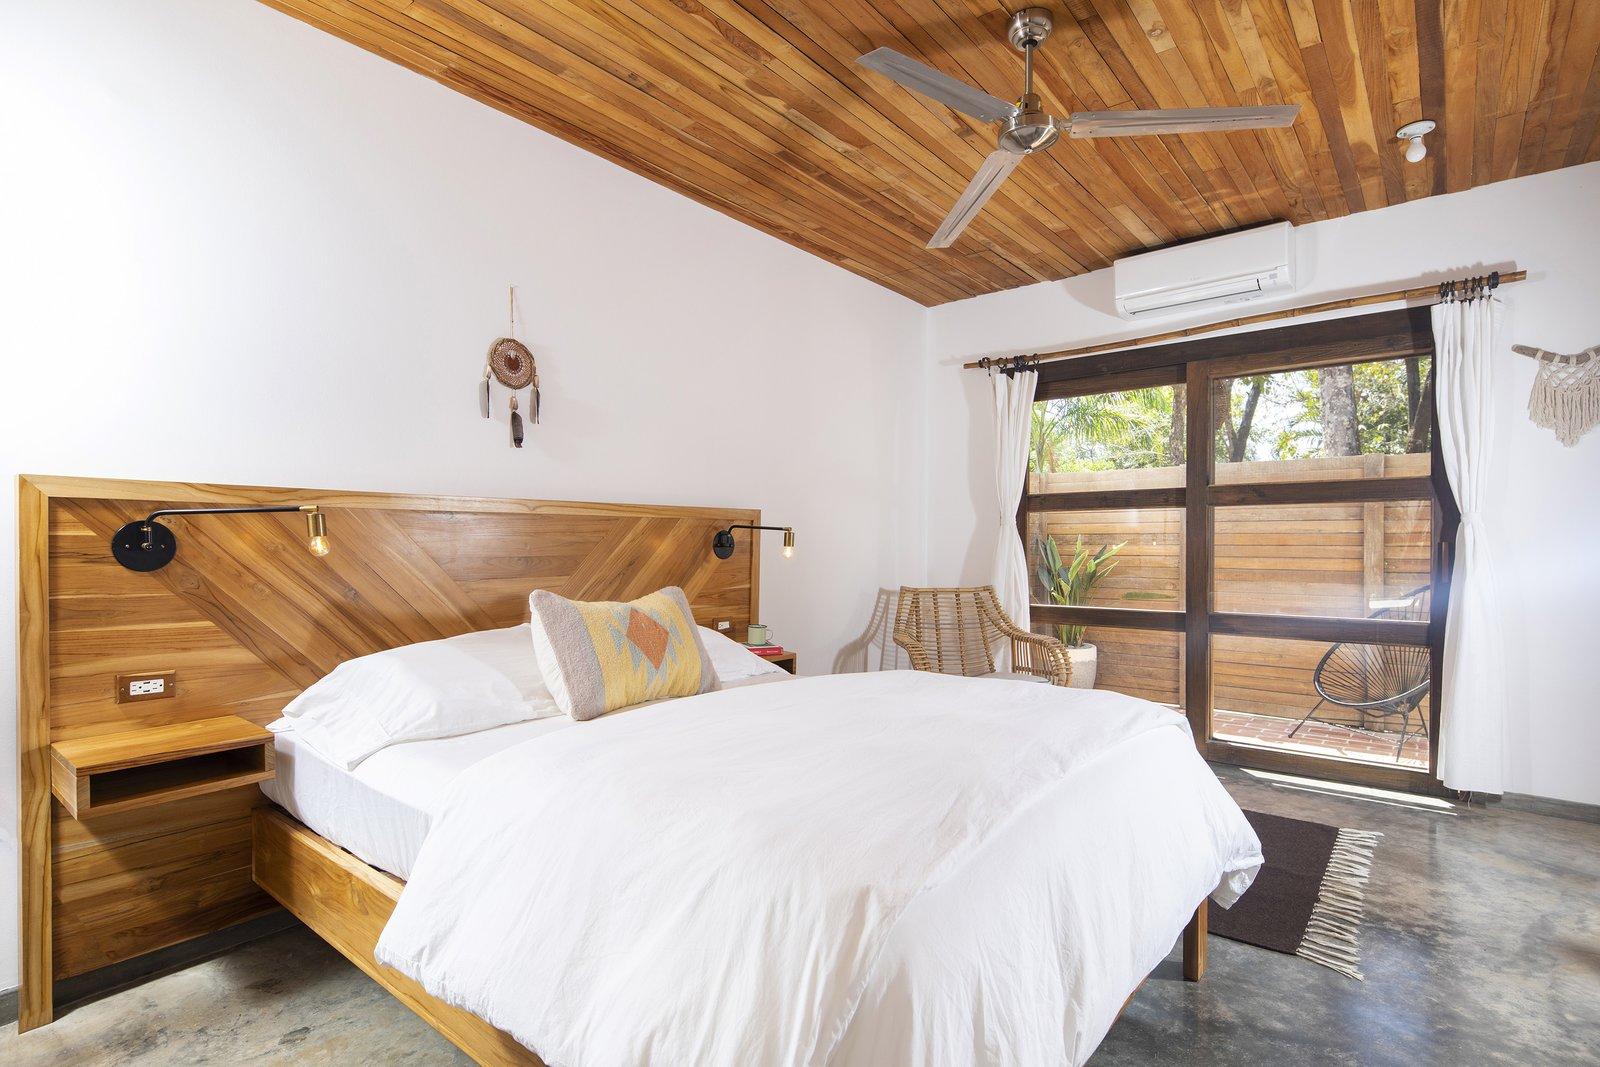 Bedroom, Bed, Concrete Floor, and Recessed Lighting Room  Nomadic Nosara